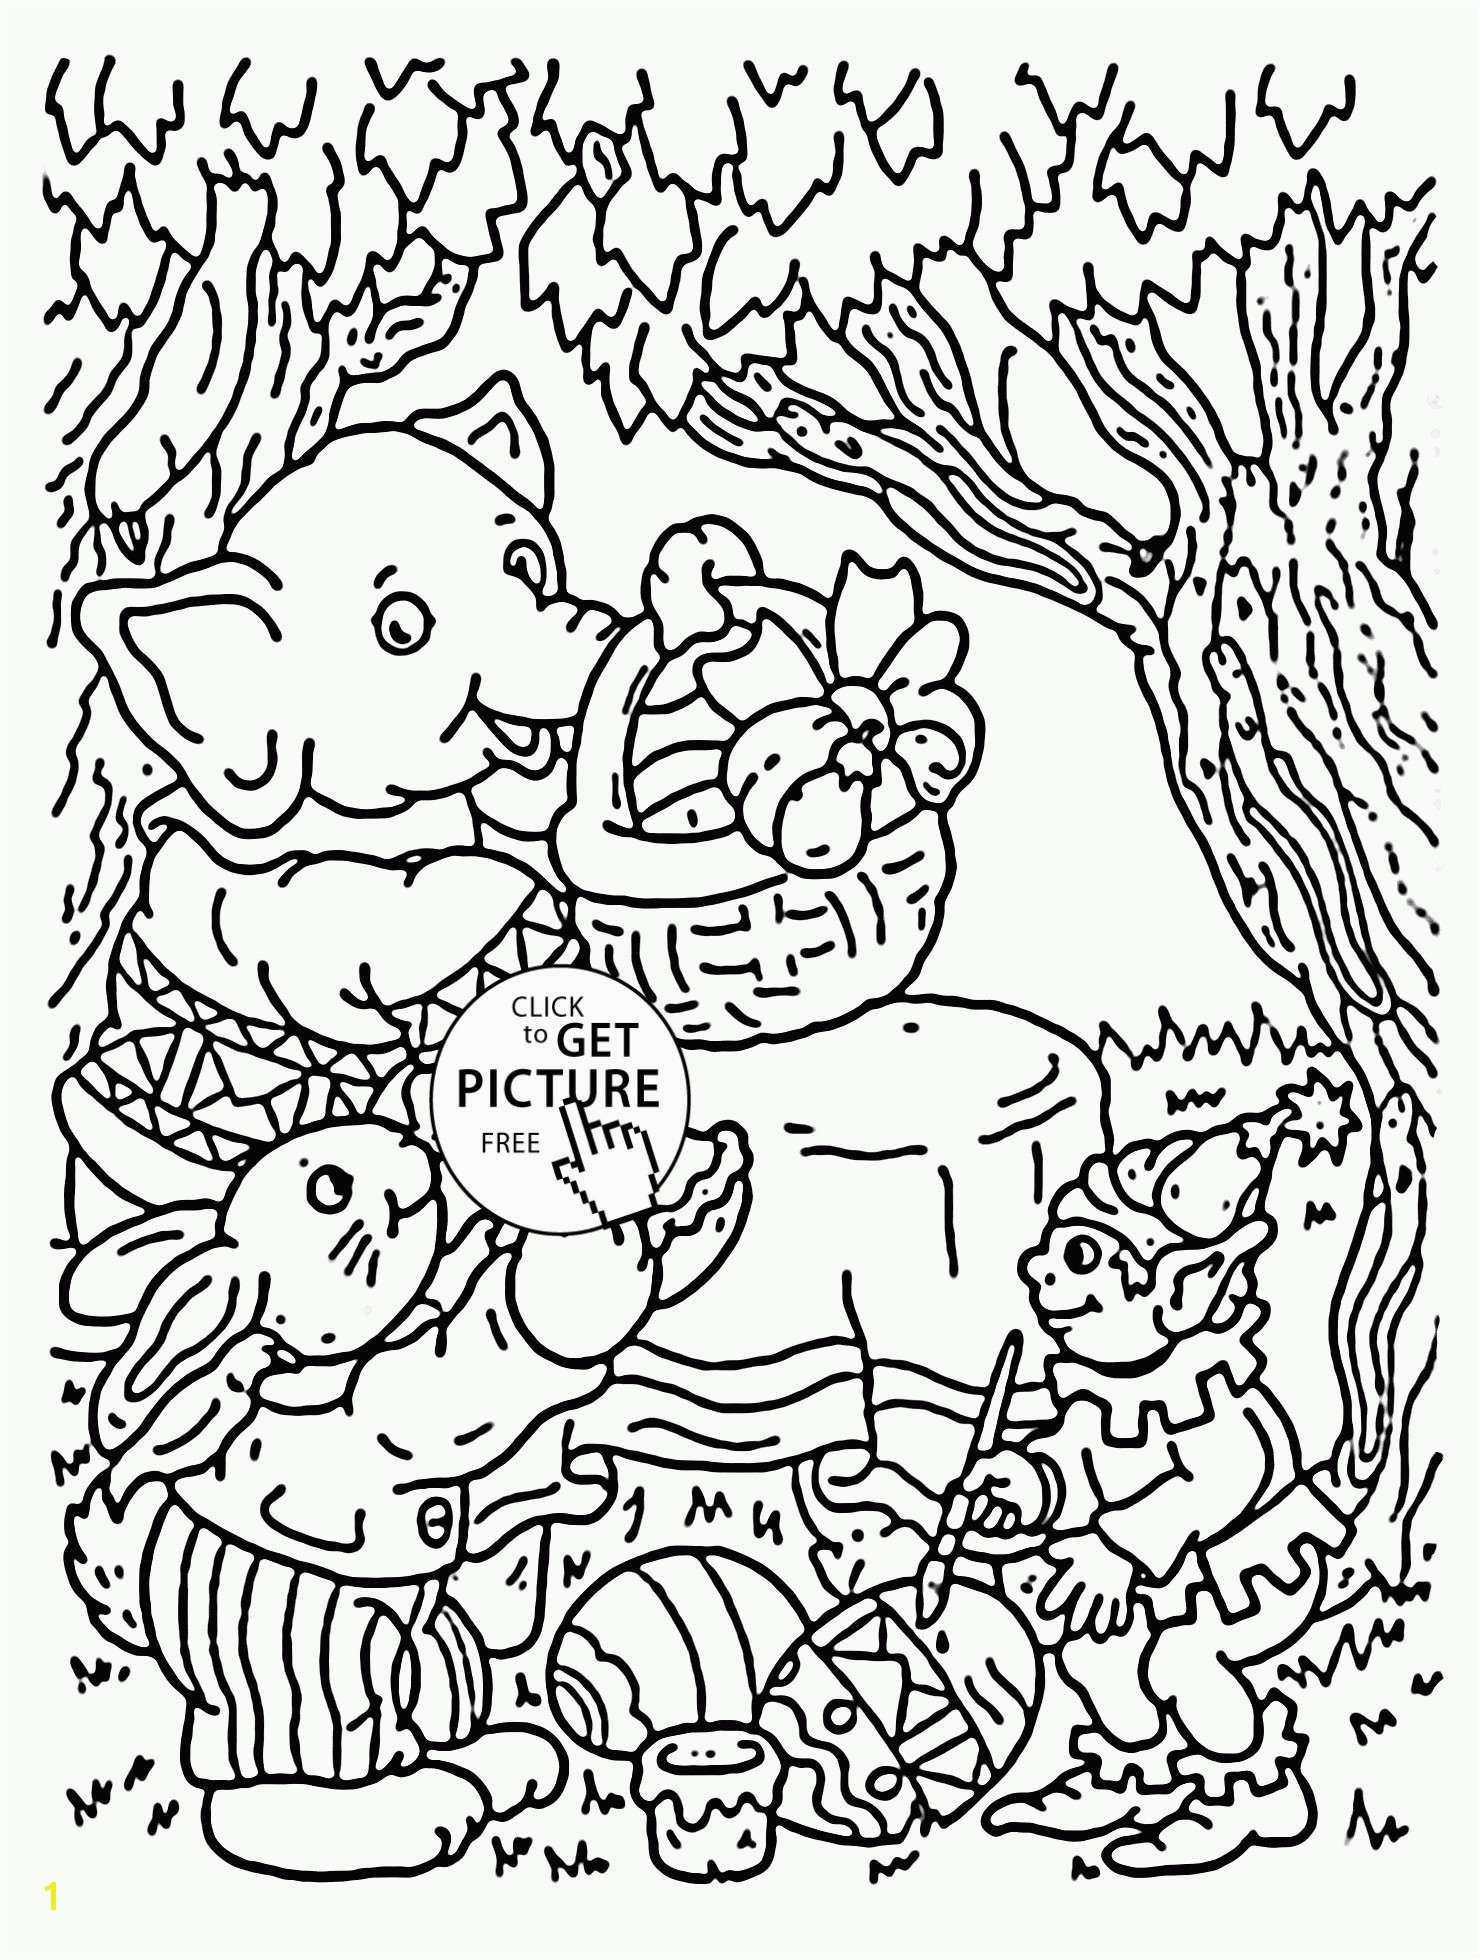 Best Print Coloring Pages Luxury S S Media Cache Ak0 Pinimg originals 0d